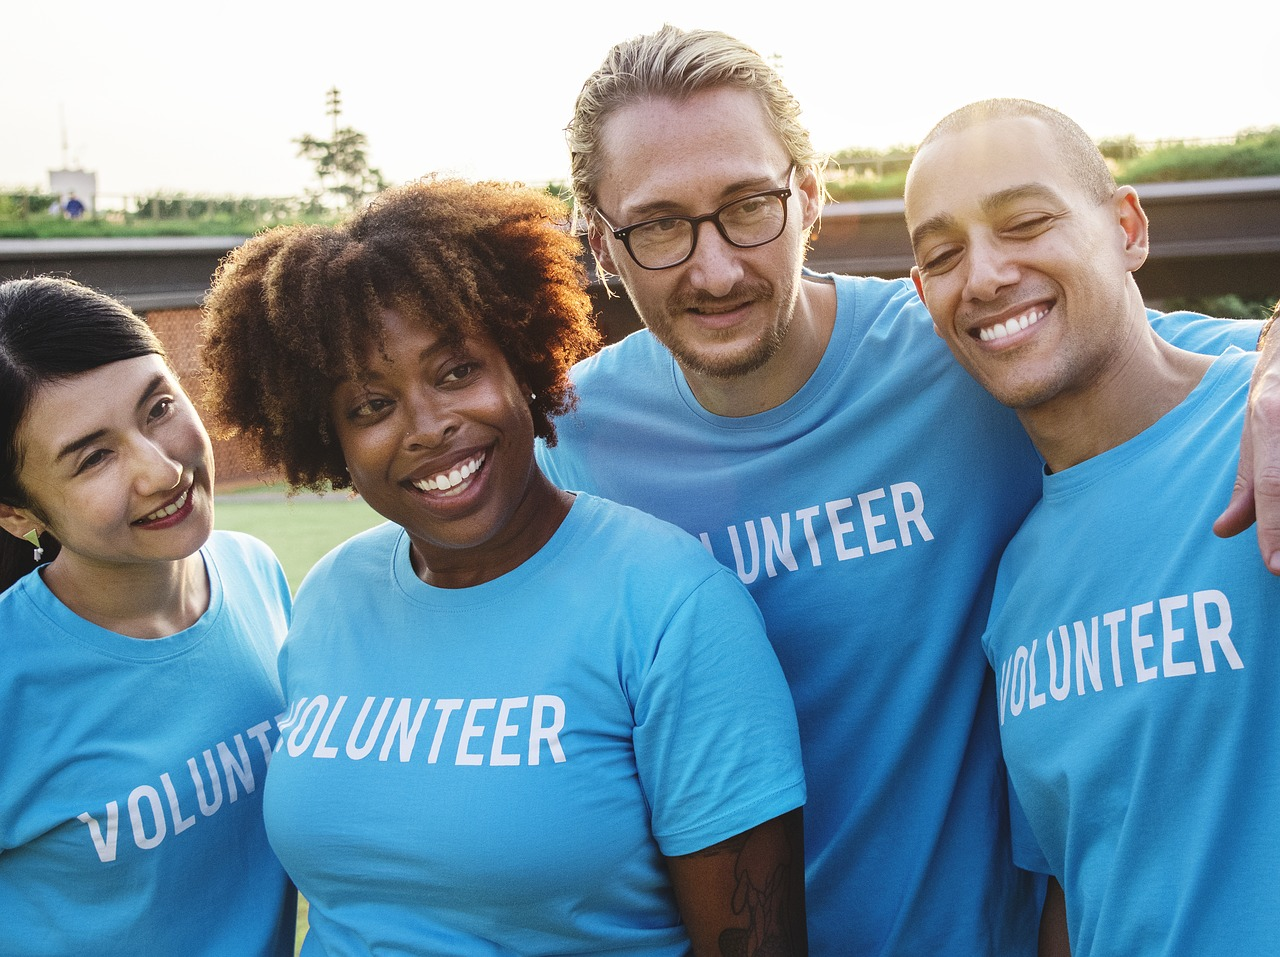 Booster Club Volunteers having fun and building community